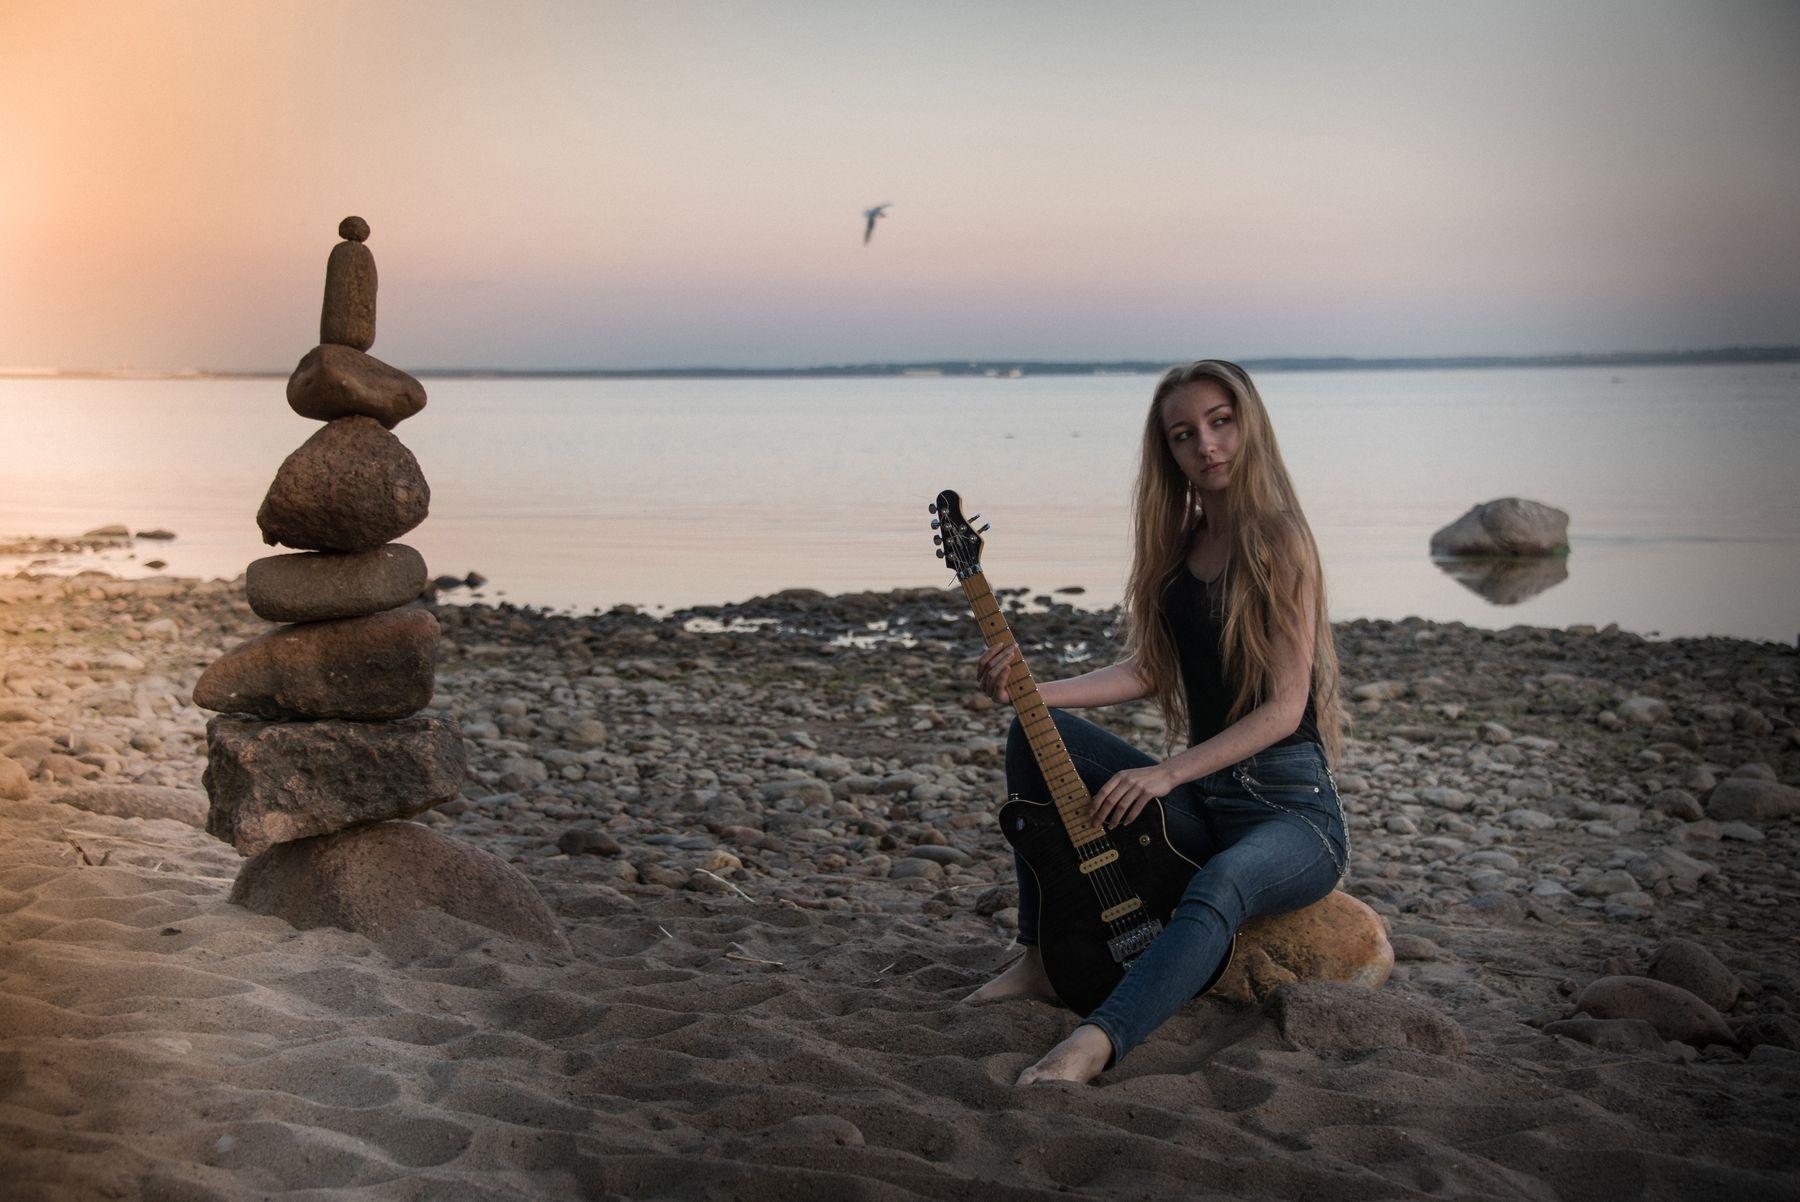 На заливе на заливе модель Кронштадт музыкант красивое фото